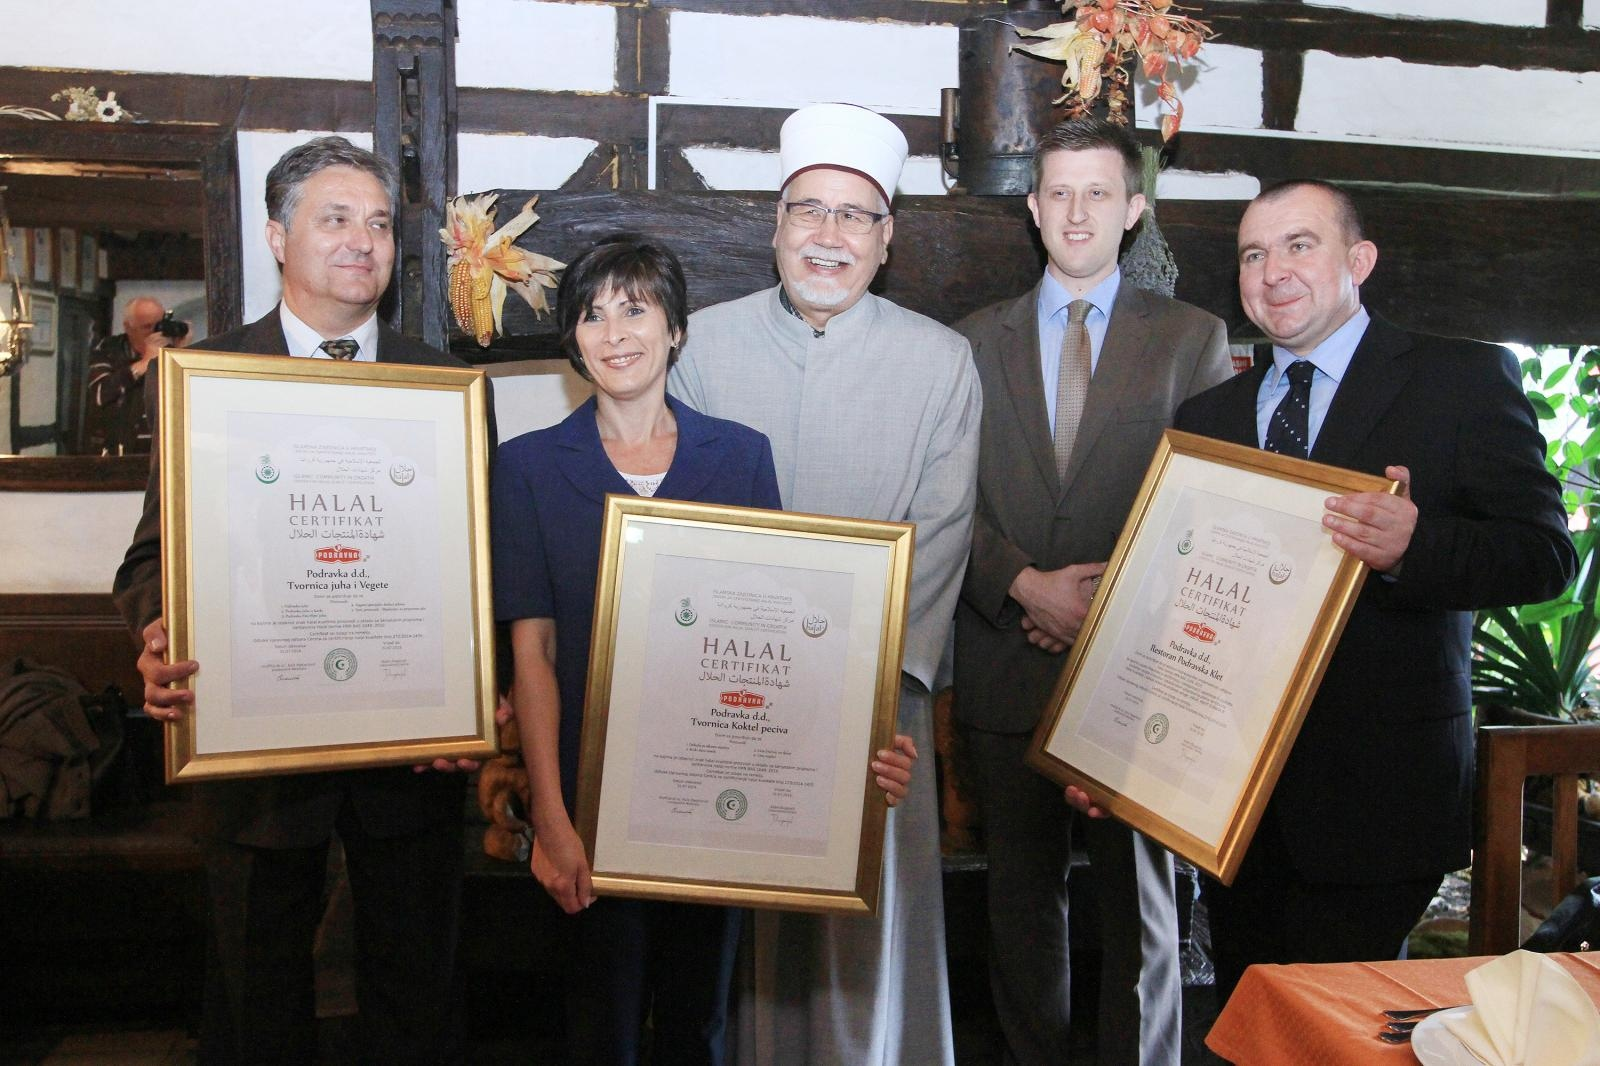 Halal certifikati - Koprivnica, Hrvaška Vir:Pixell